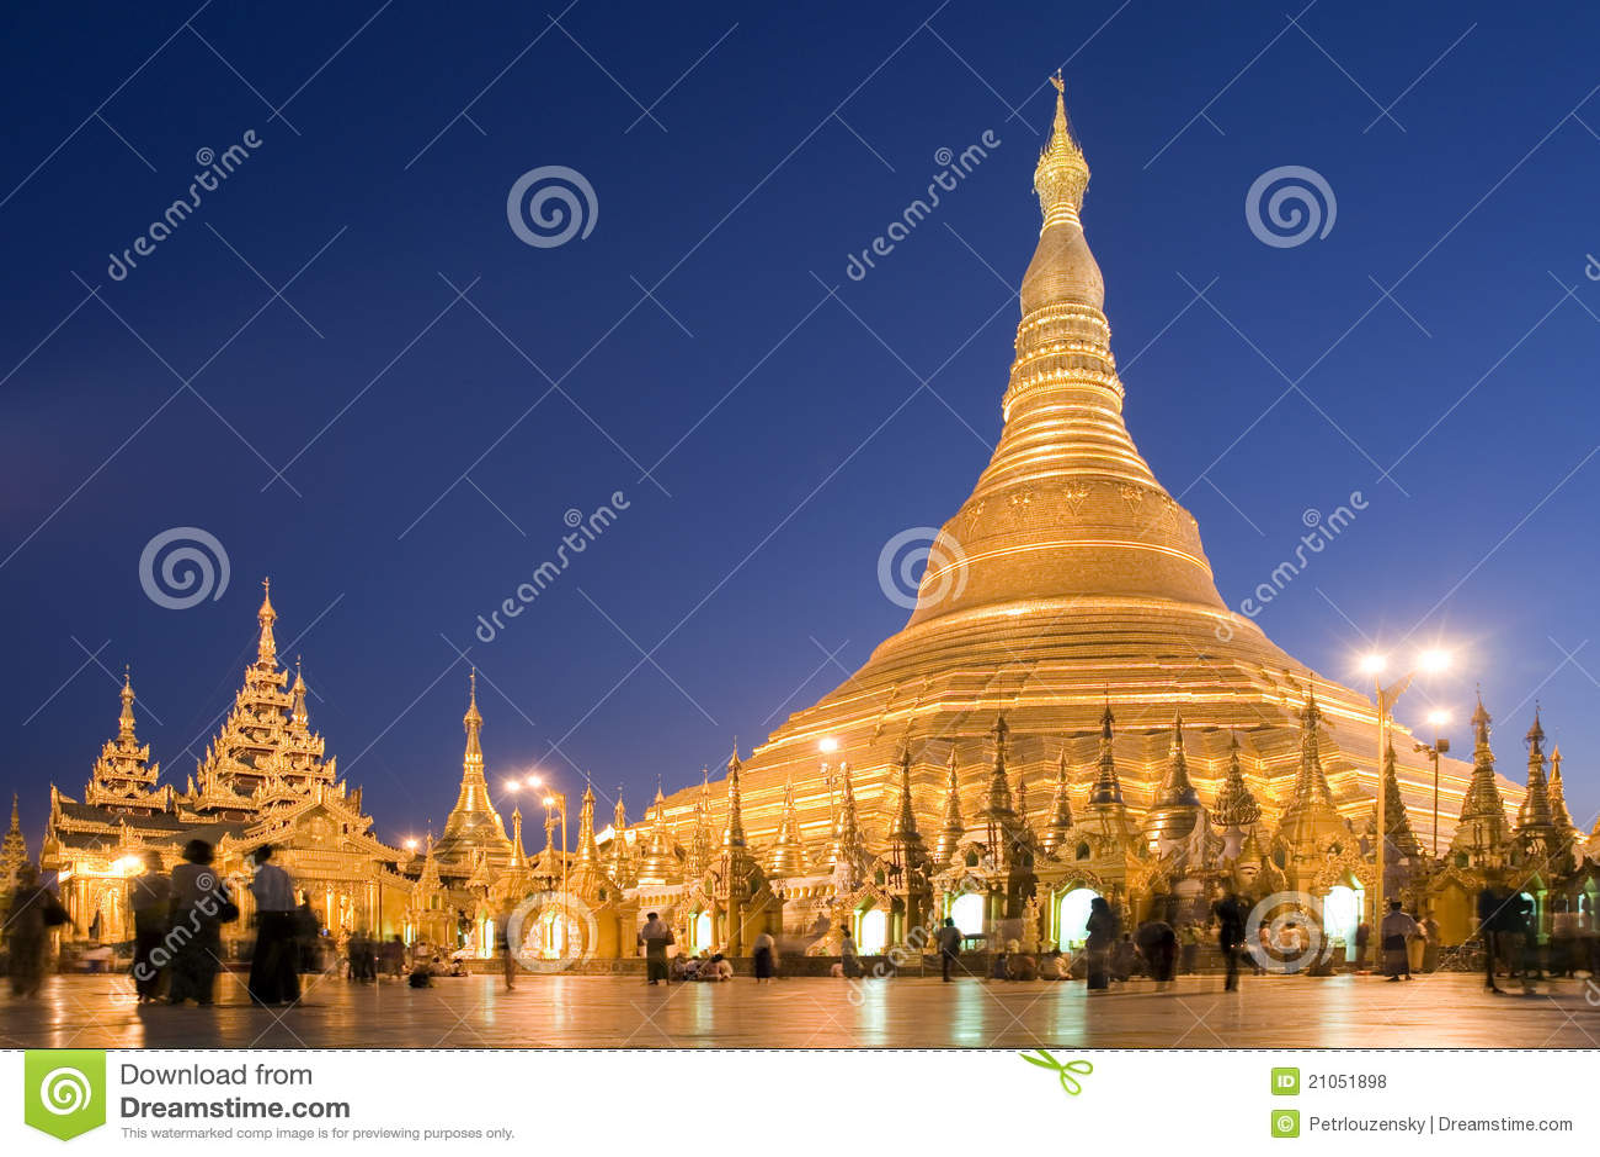 缅甸缅甸塔shwedagon仰光